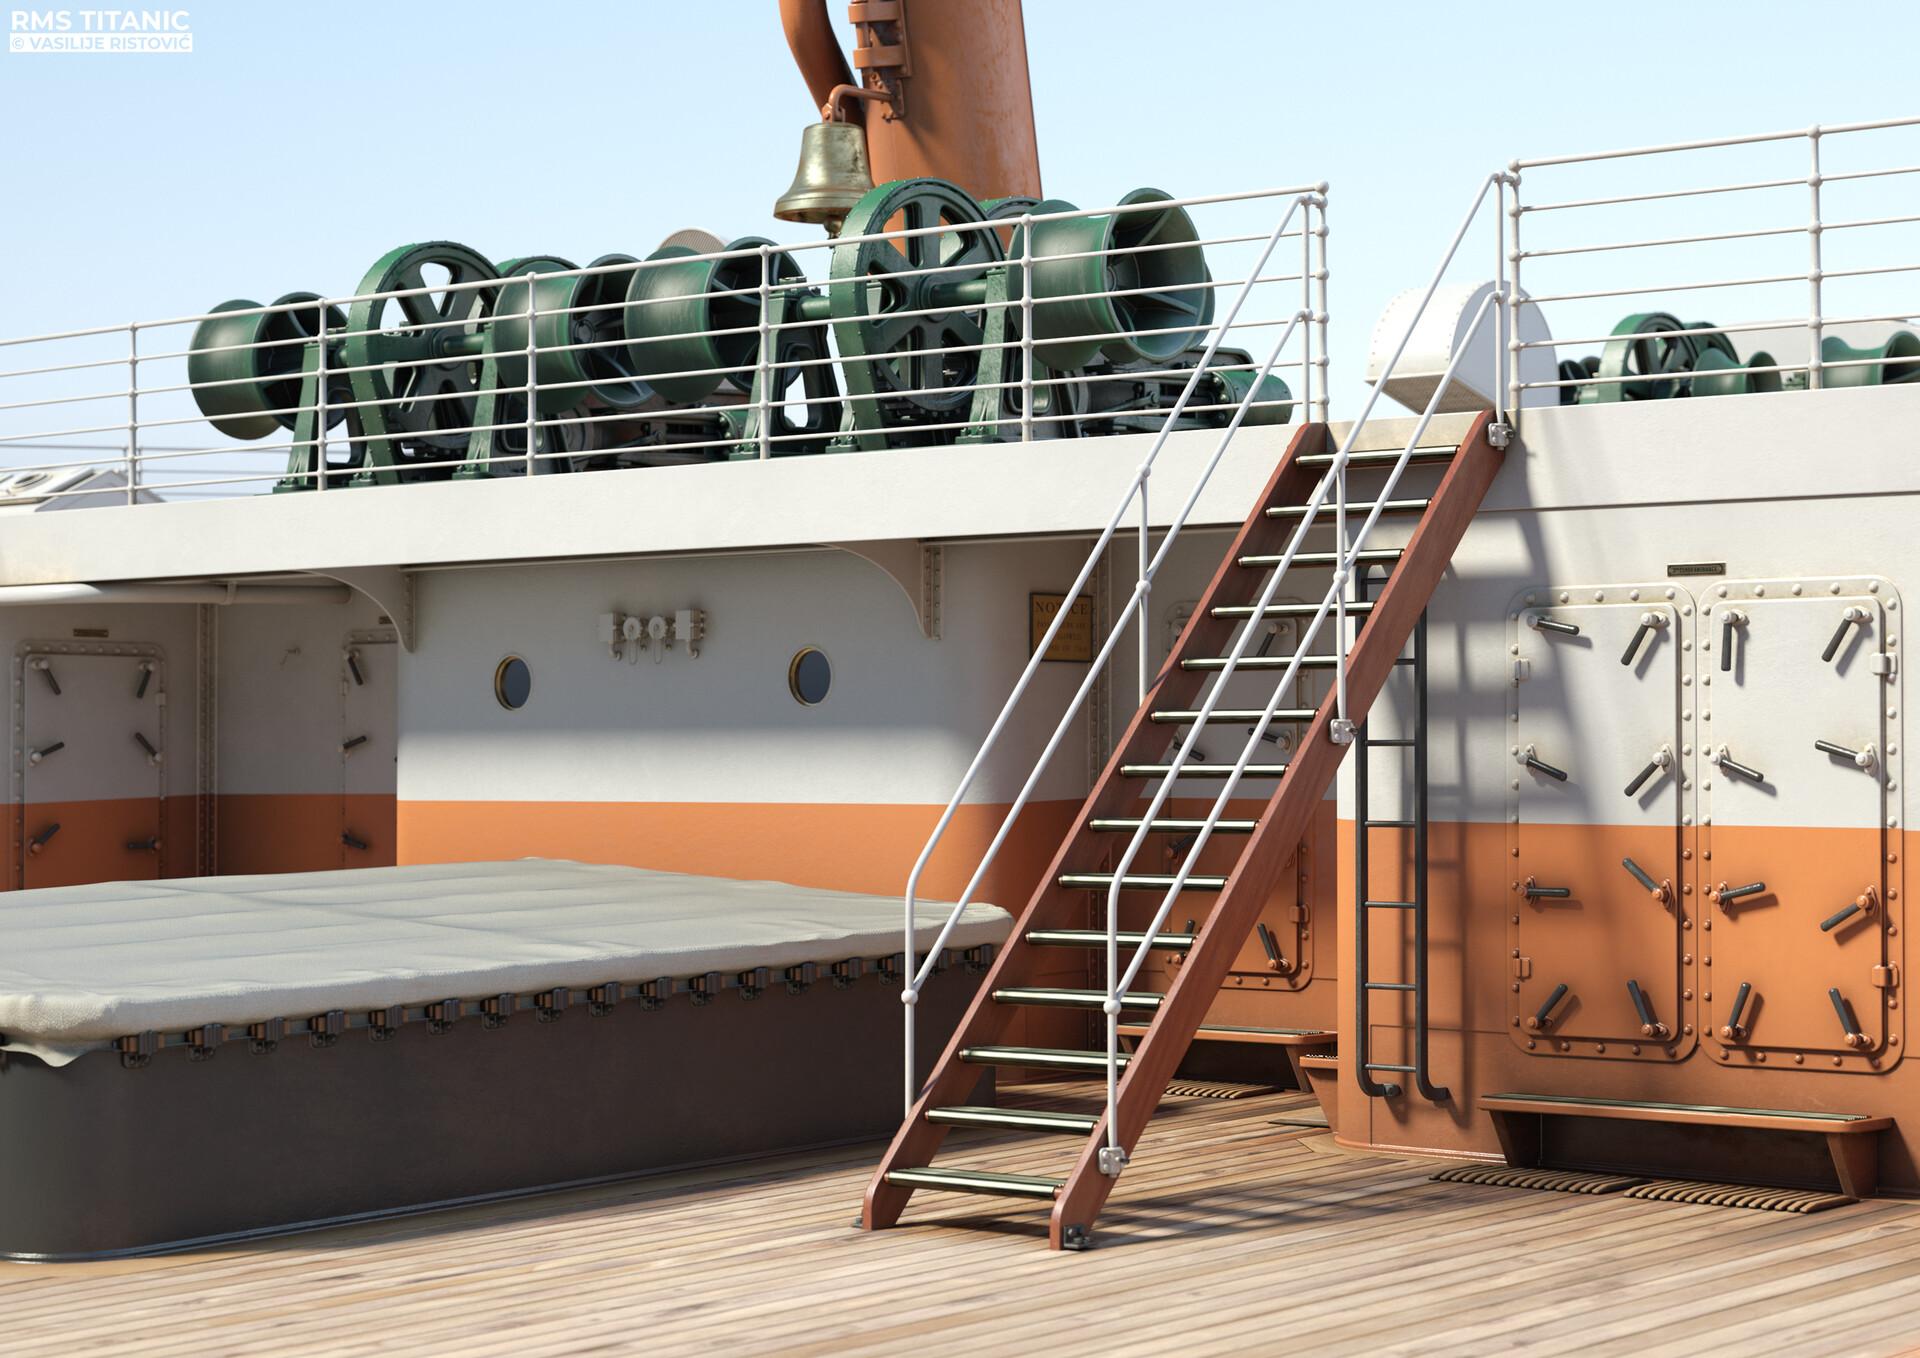 Montage Titanic Trumpeter 1/200 - Page 10 Vasilije-ristovic-04